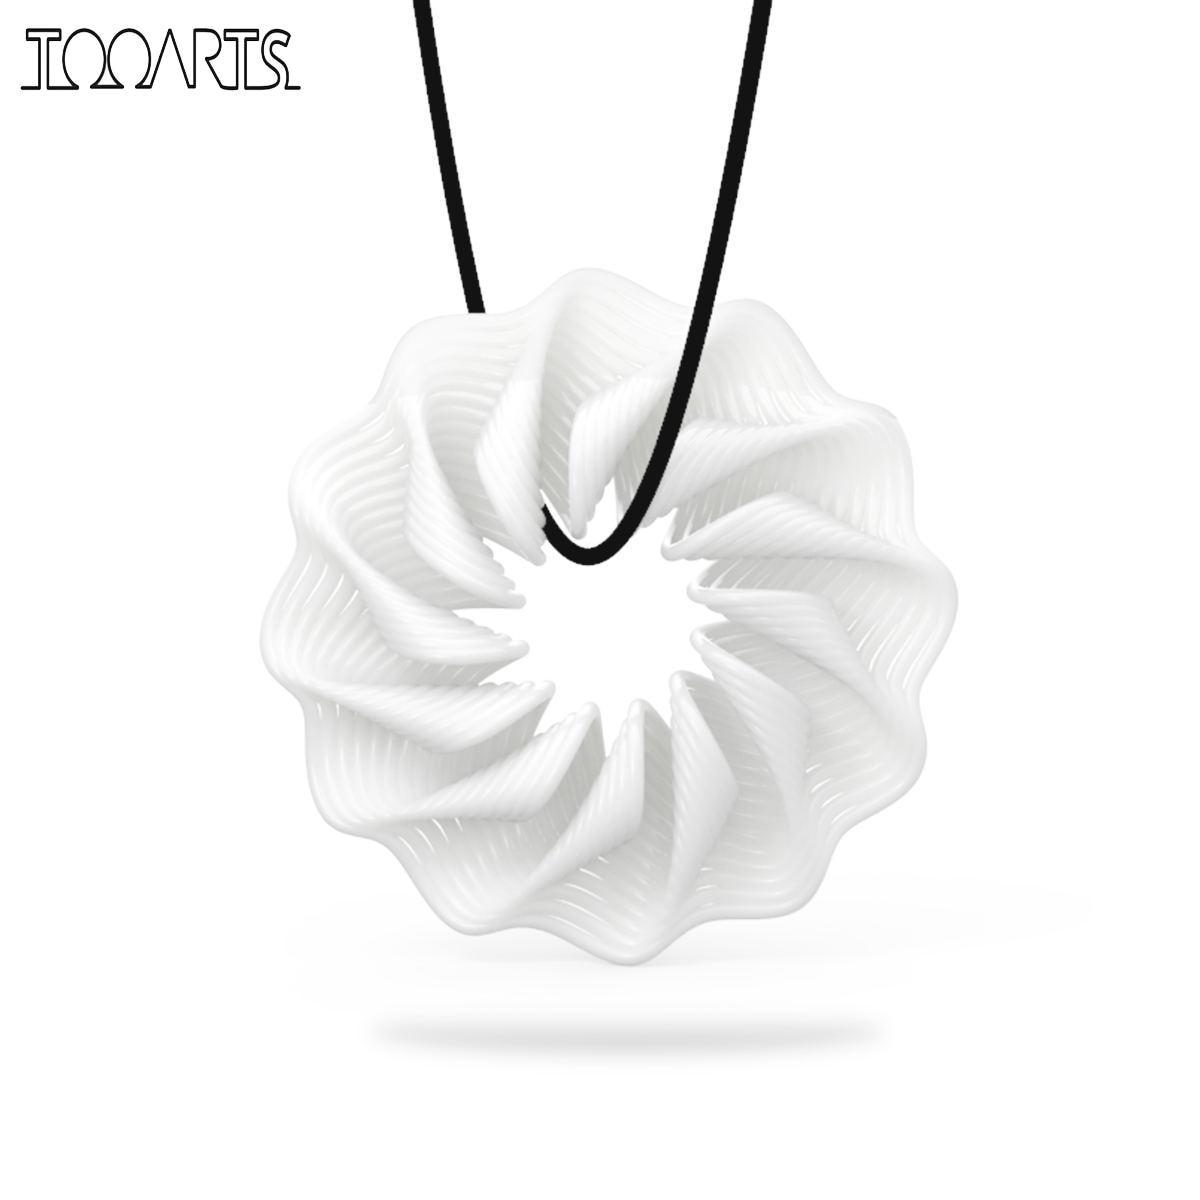 Tooarts Tomfeel 3D gedrukte sieraden ritme elegante modellering - Huisdecoratie